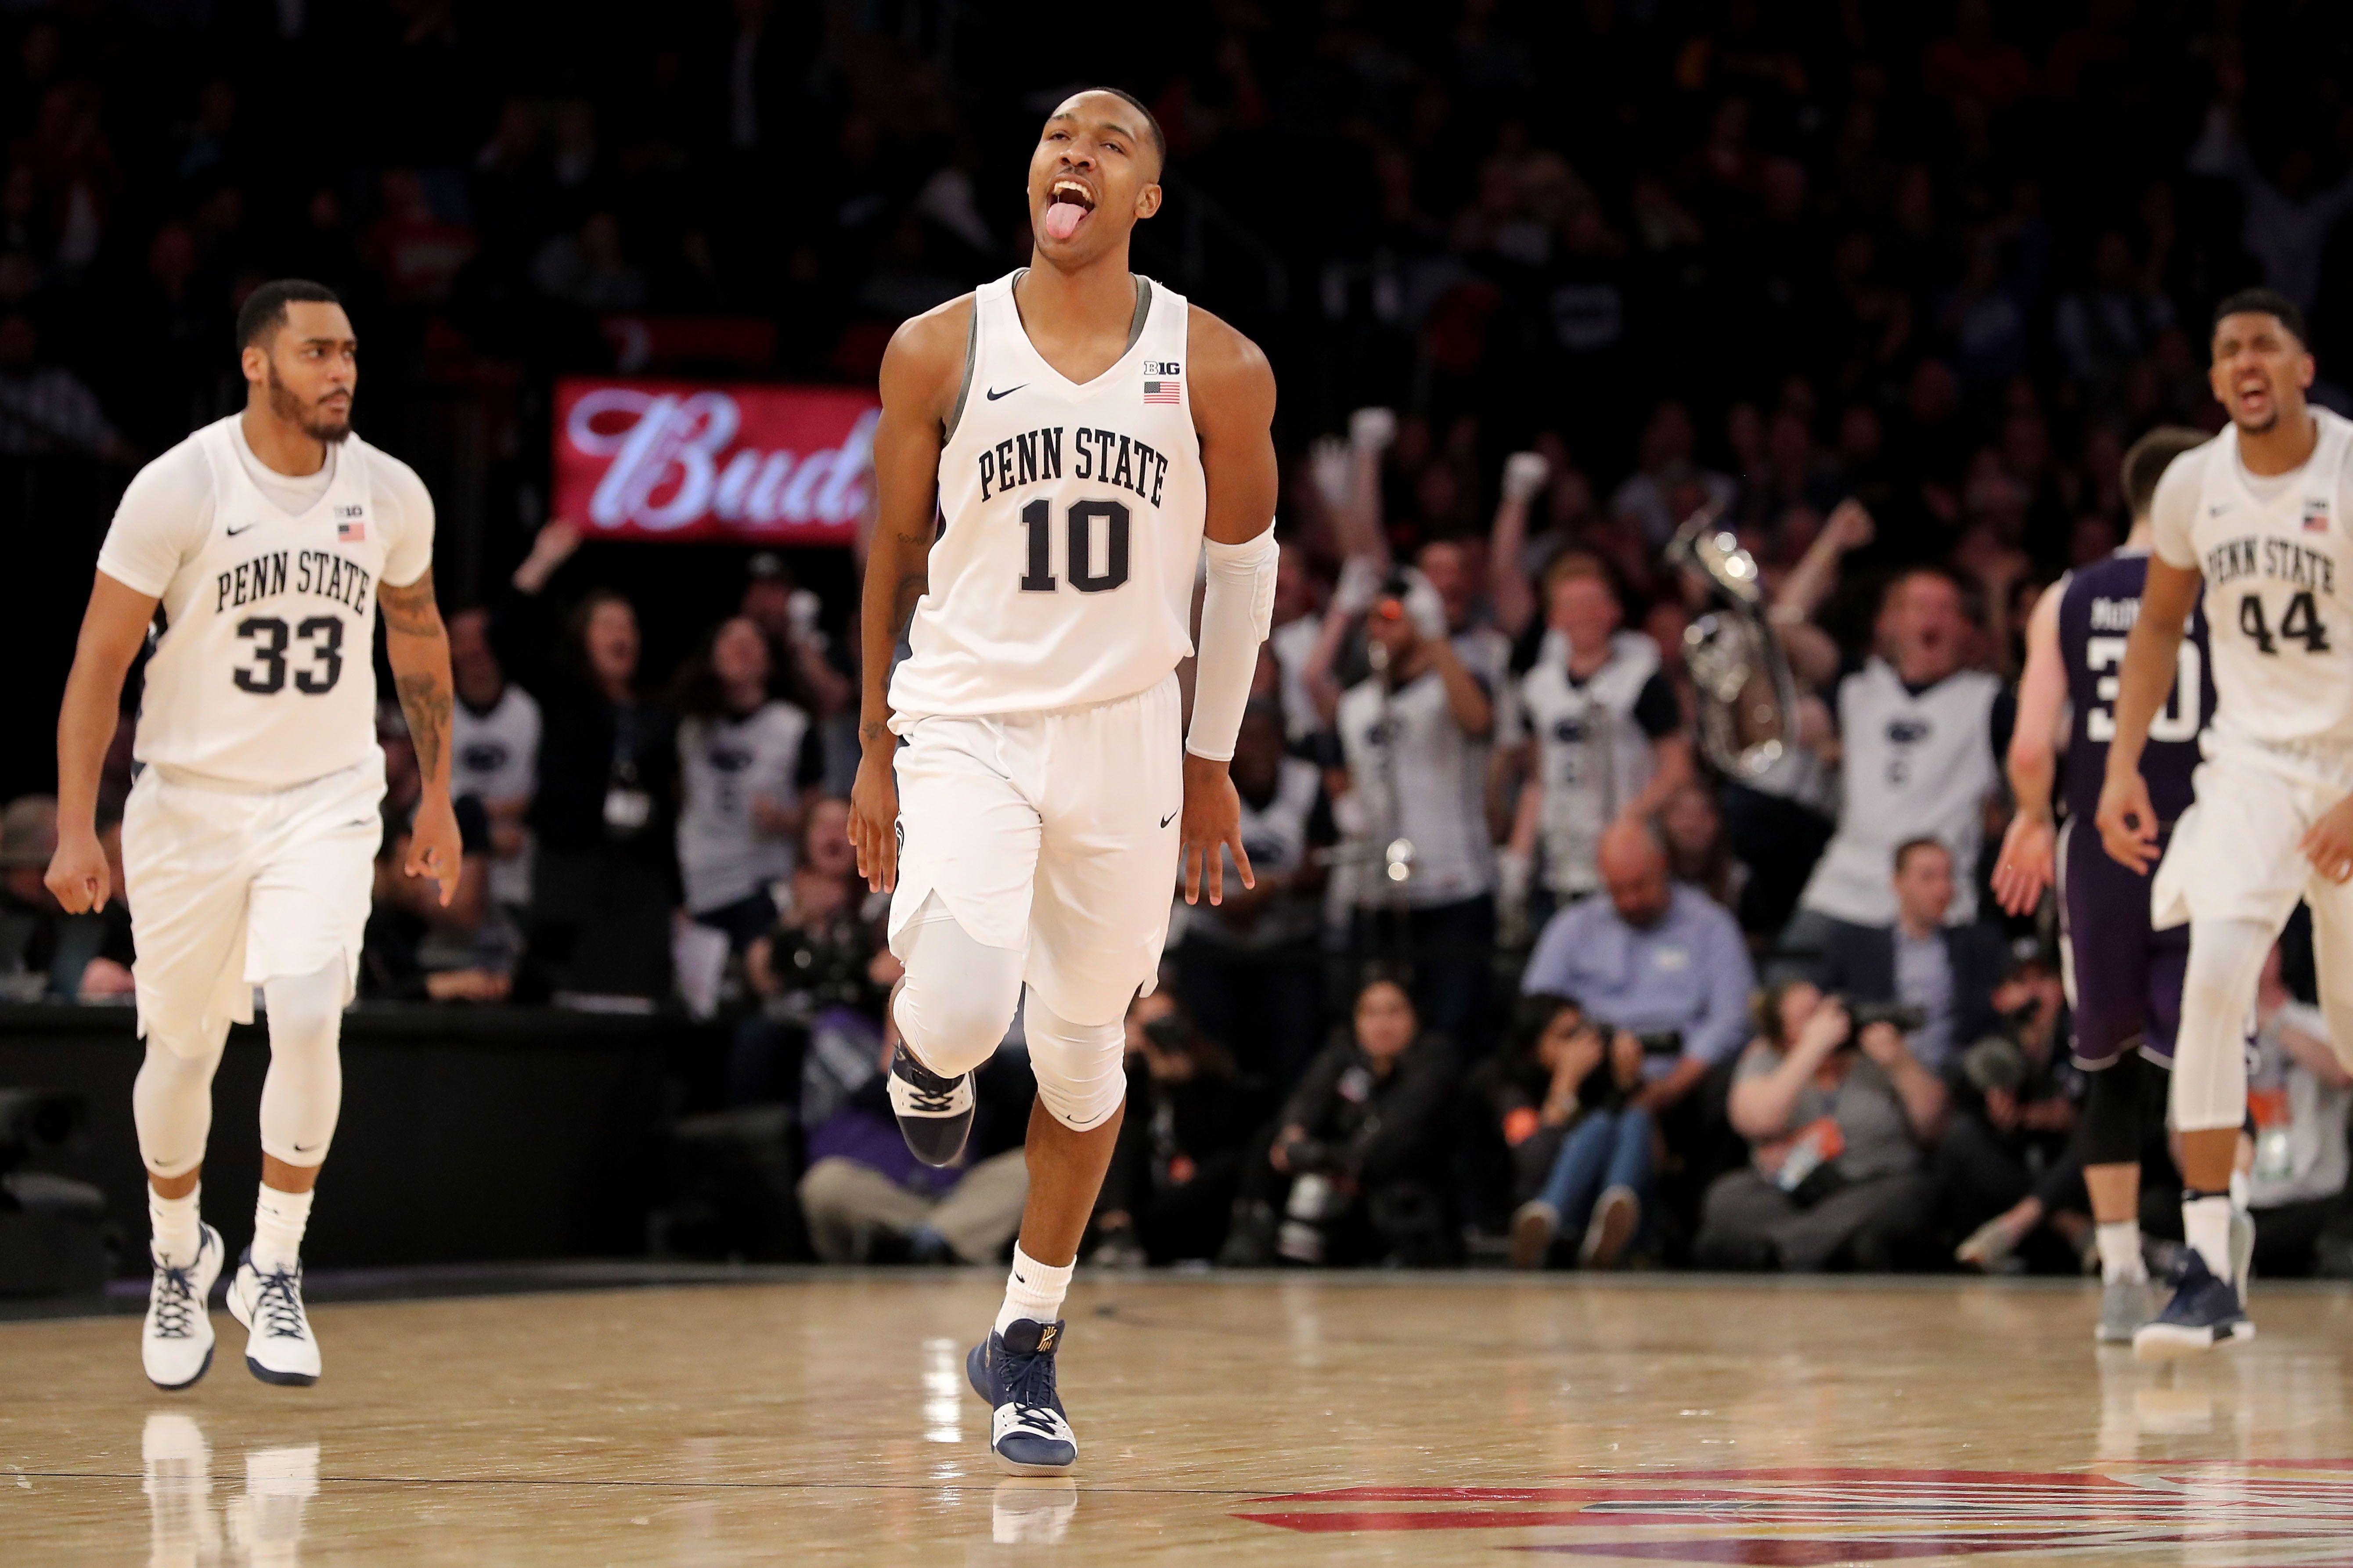 926071694-big-ten-basketball-tournament-second-round.jpg